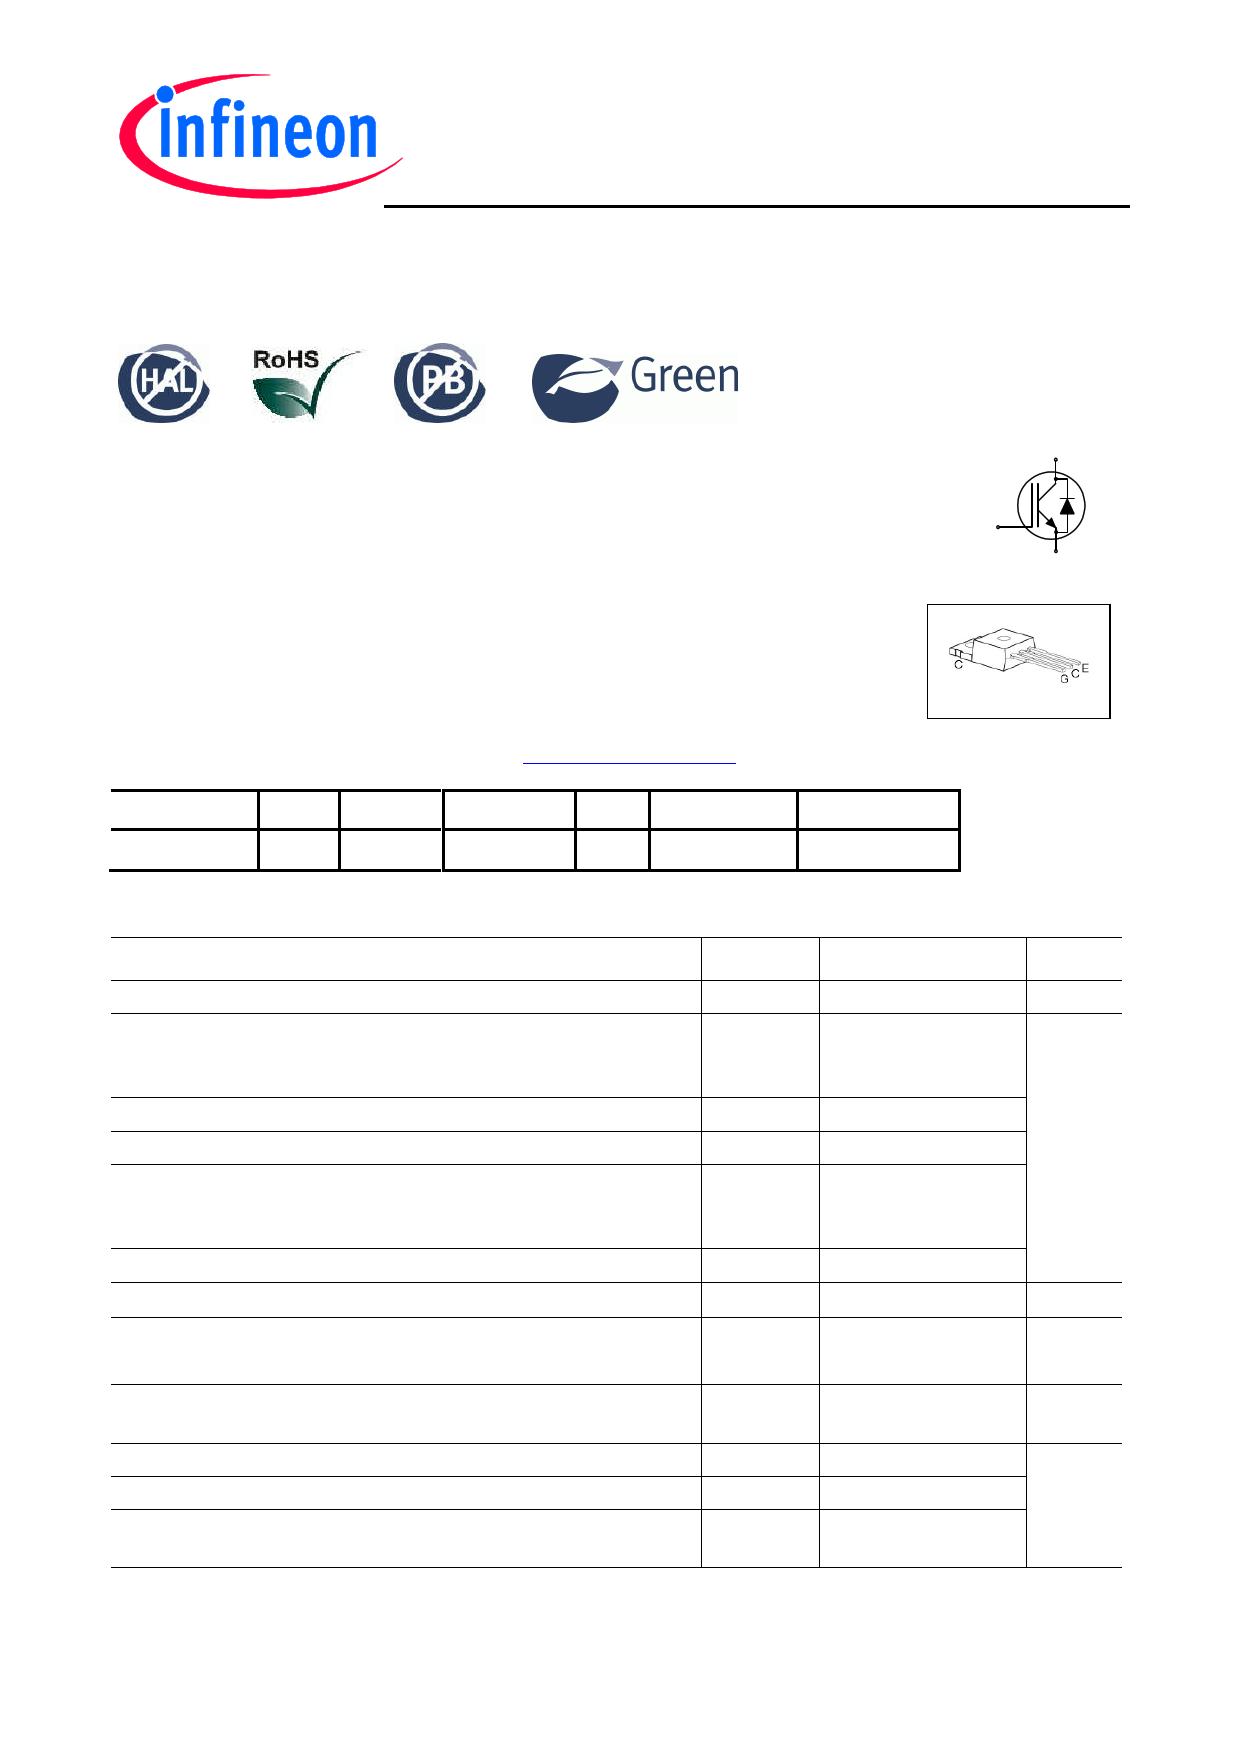 IKP06N60T Datasheet, IKP06N60T PDF,ピン配置, 機能